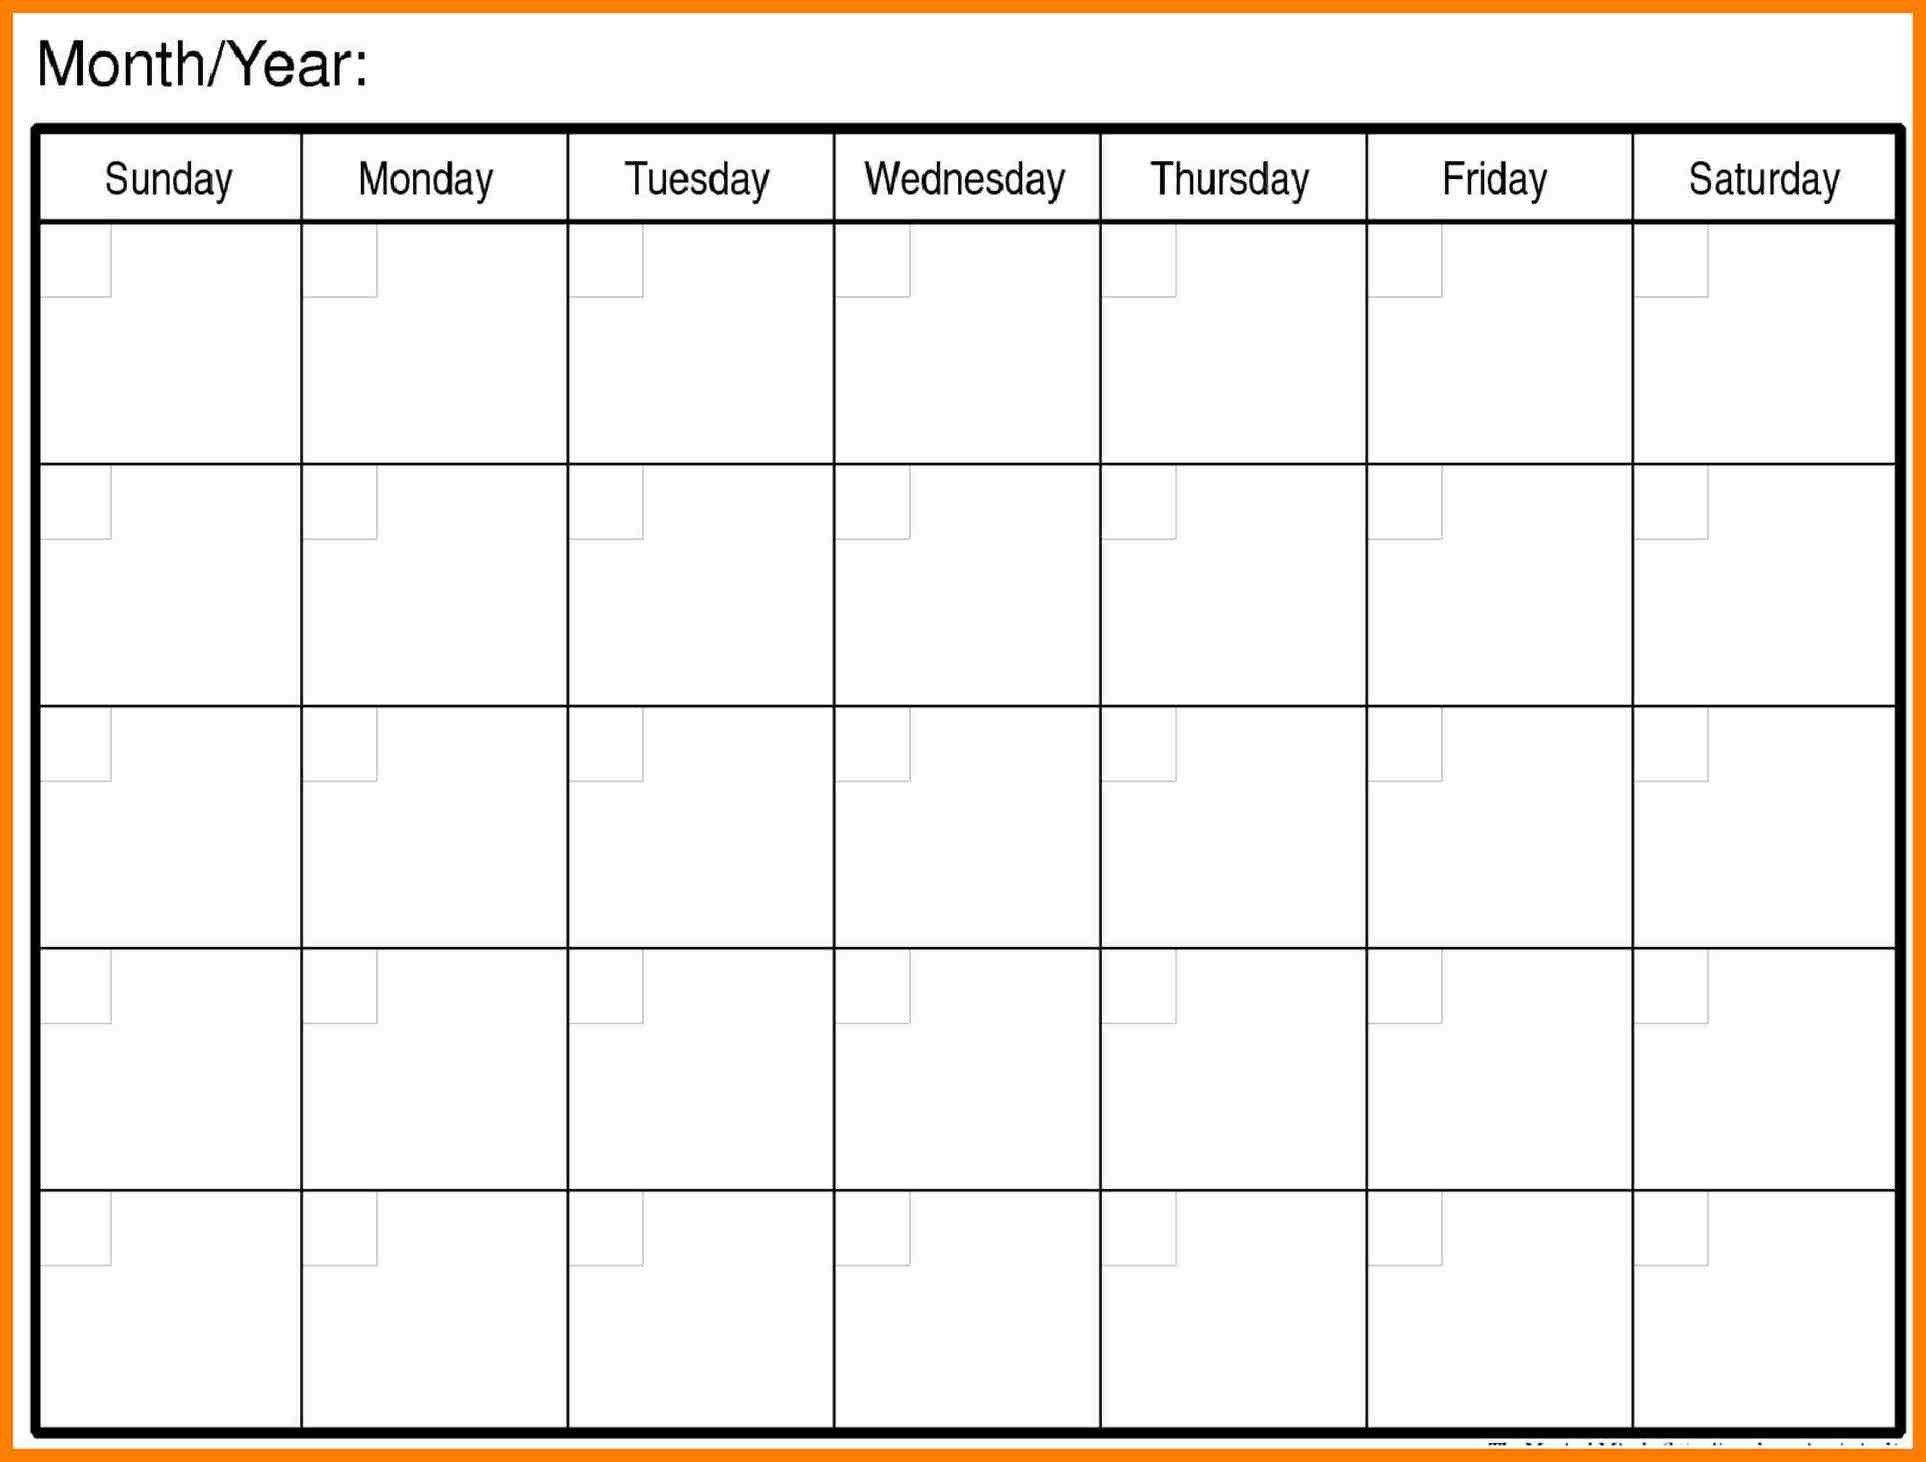 Blank Calendar Template Word | Blank Calendar Template inside Blank Calendar Template Word